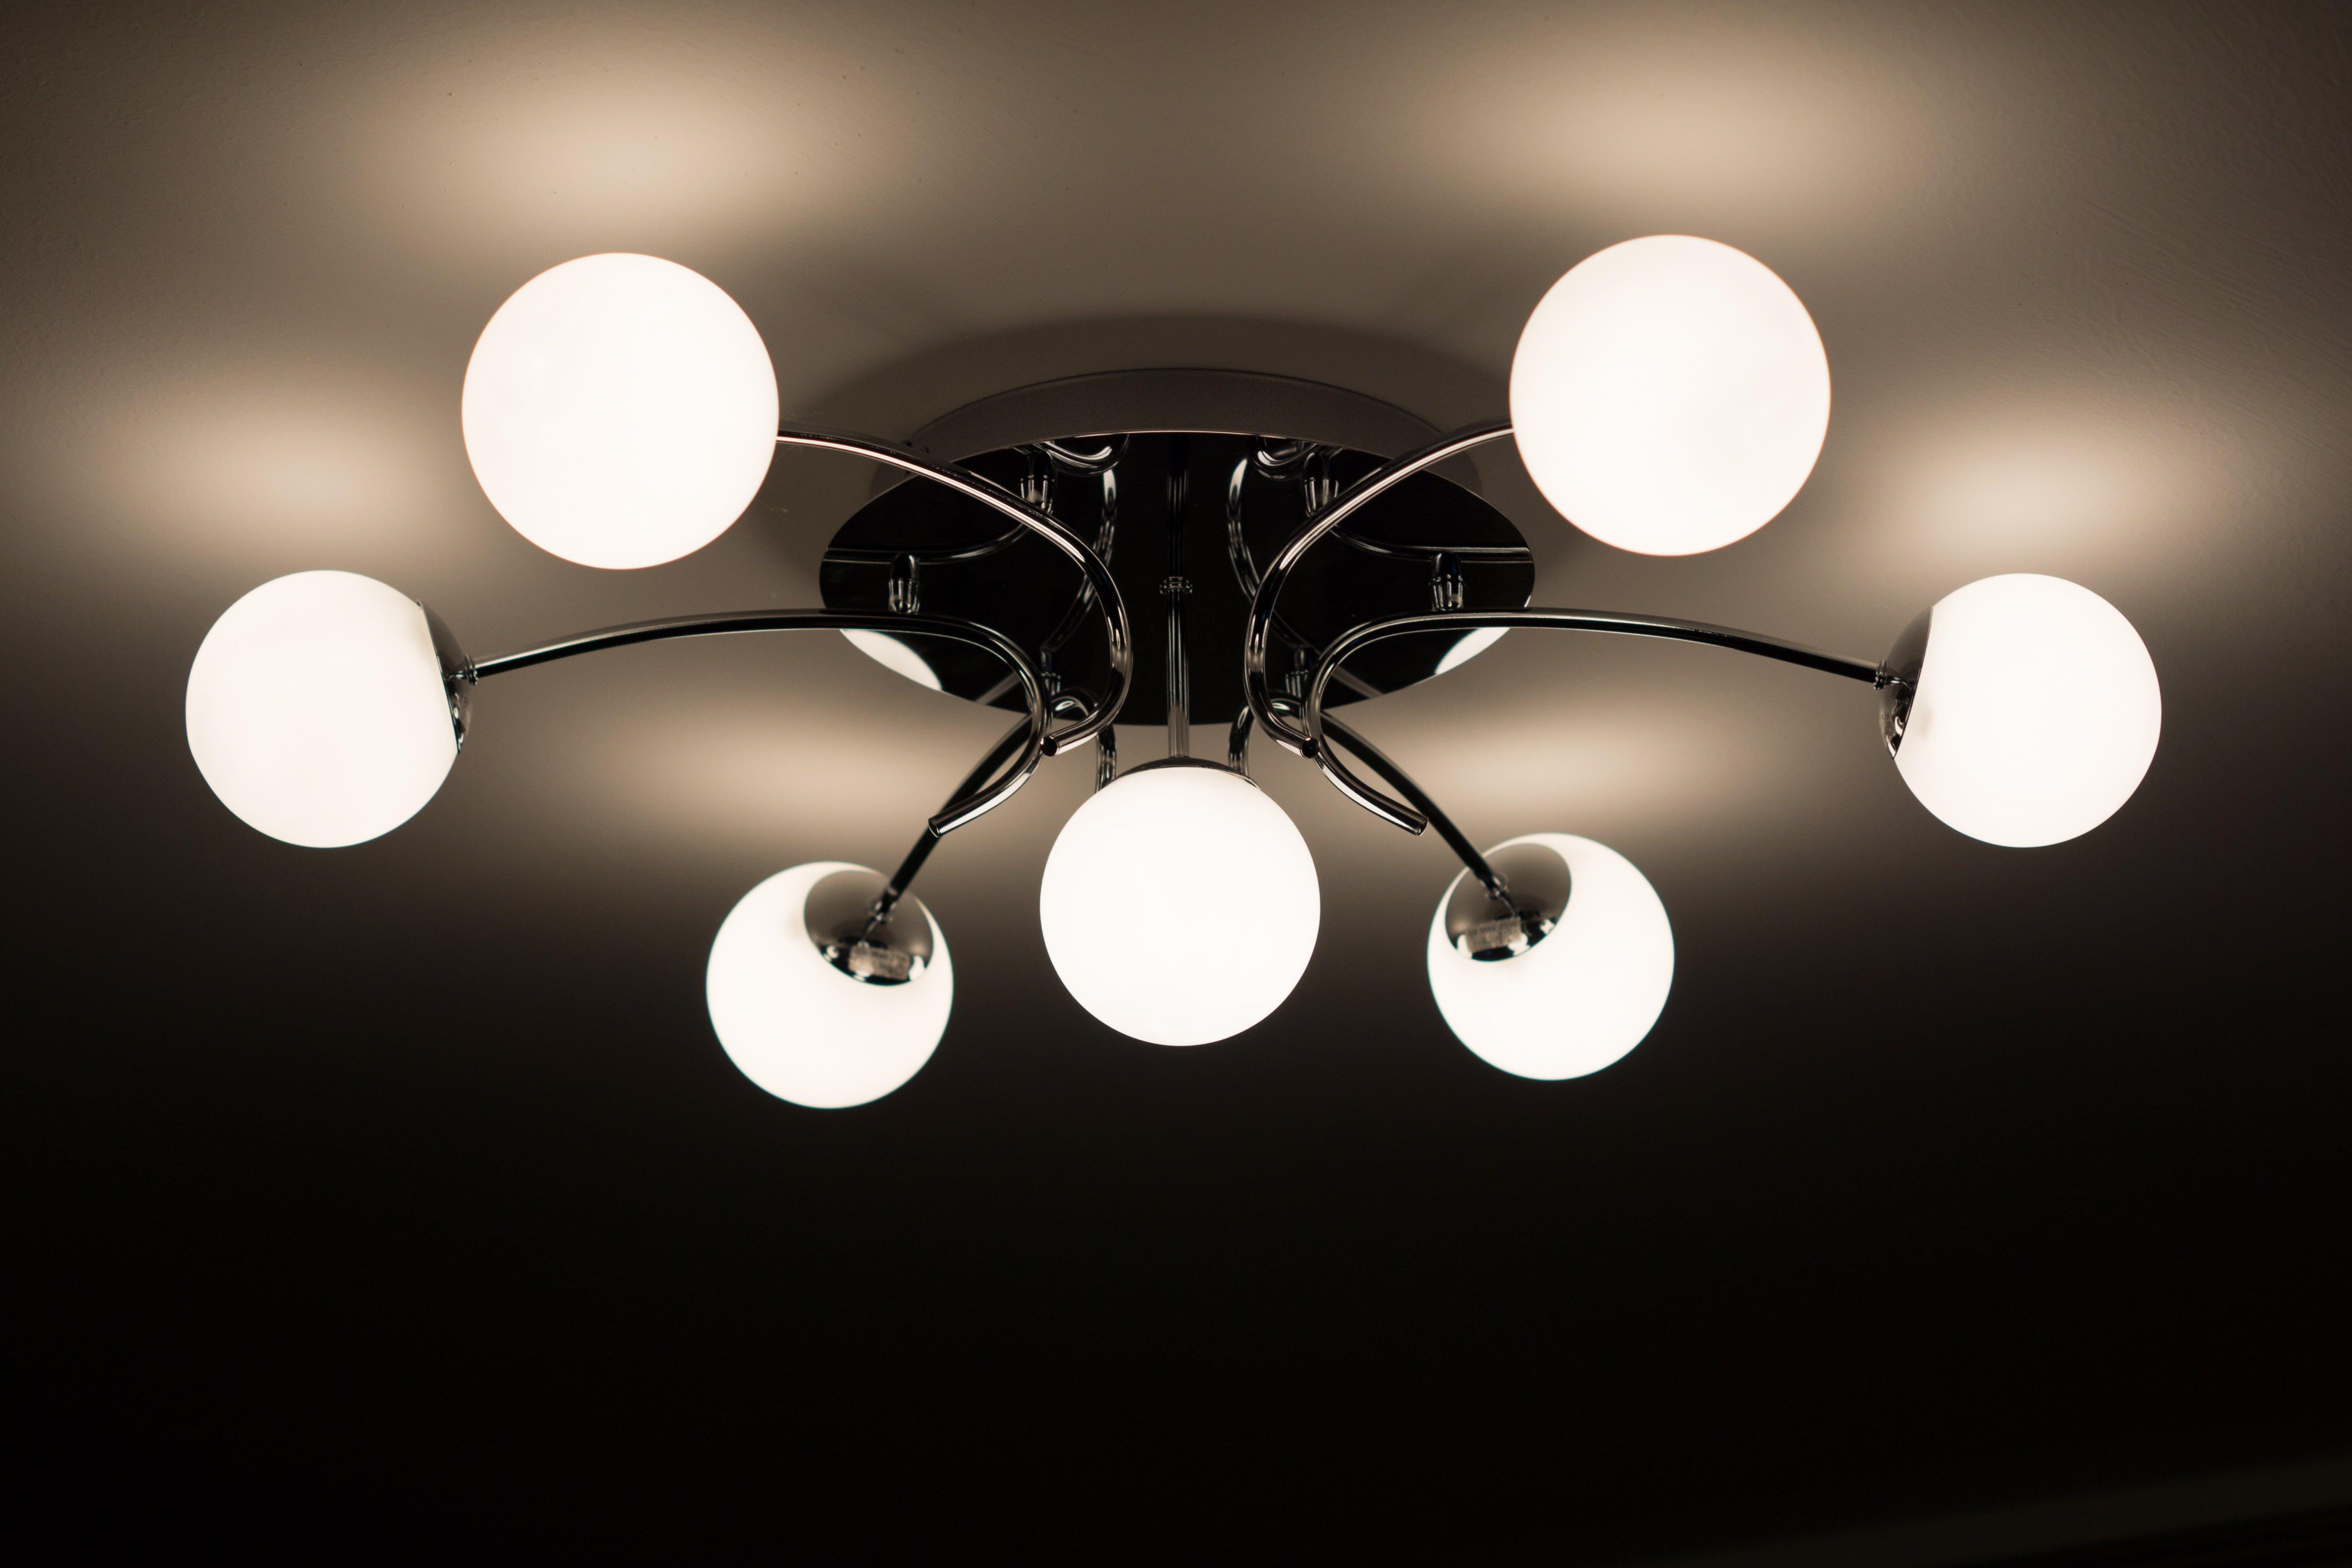 Silver Flush Mount Ceiling Light With Seven White Globe Lights